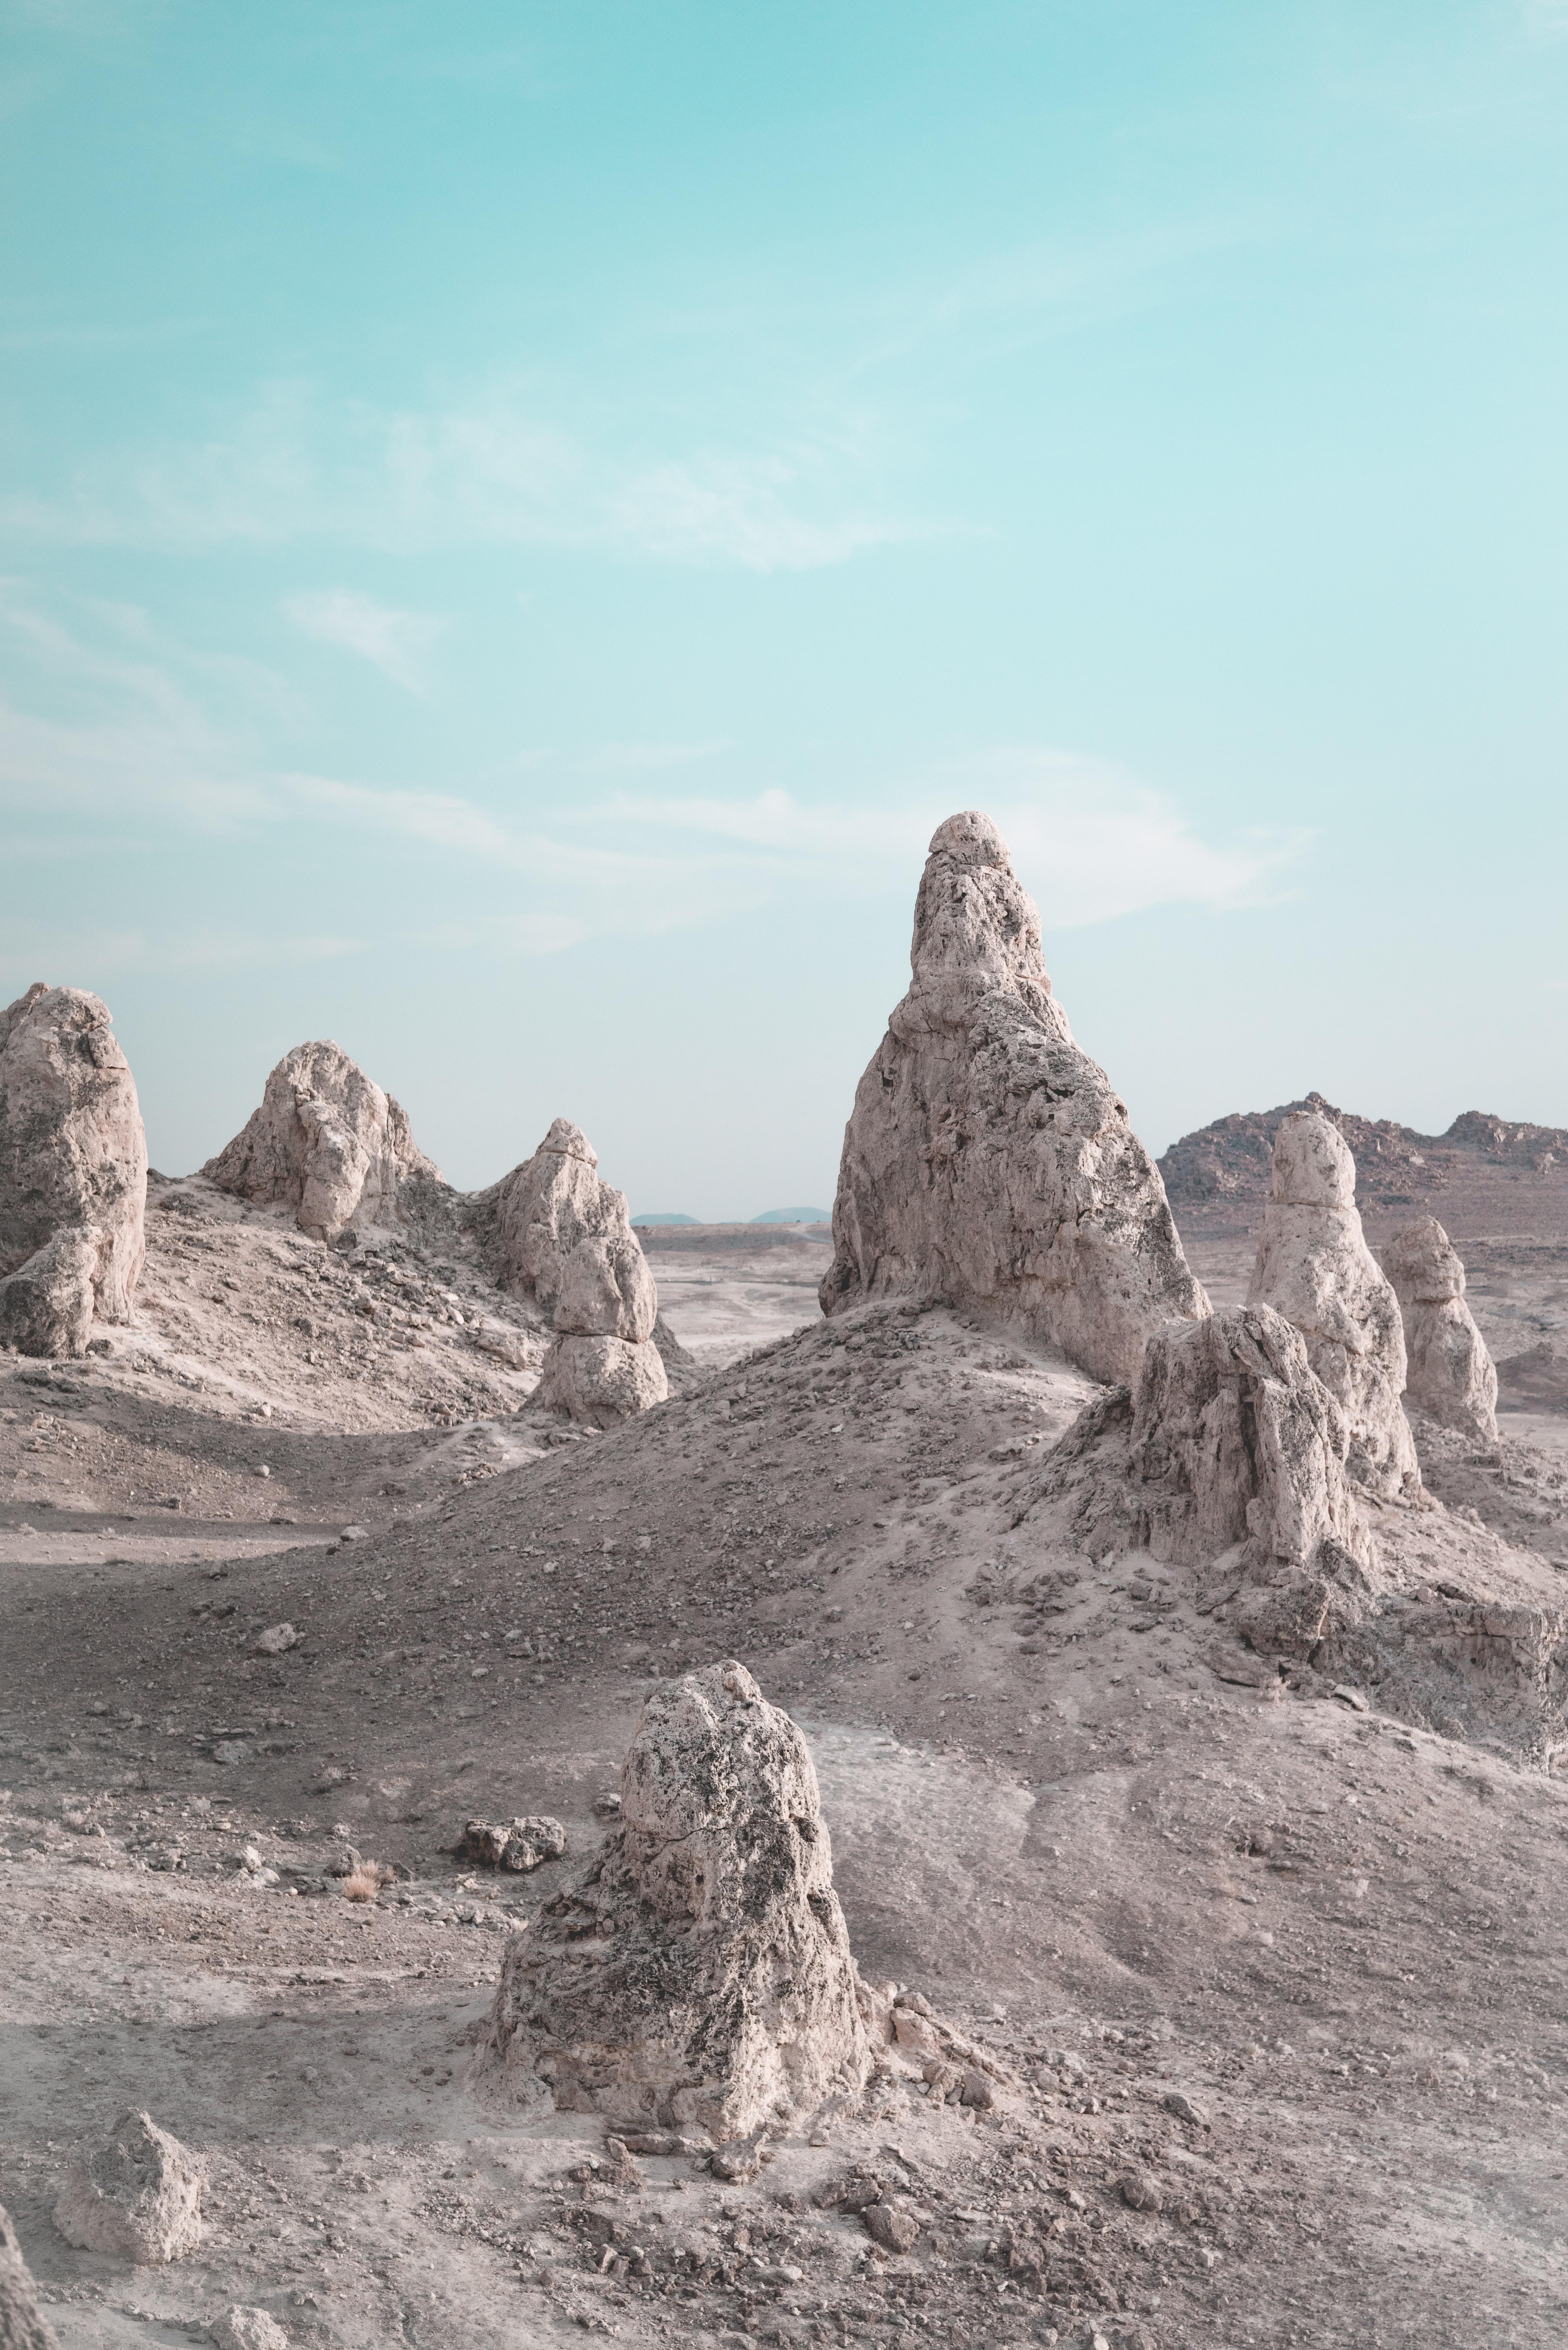 gray rock formation under blue sky